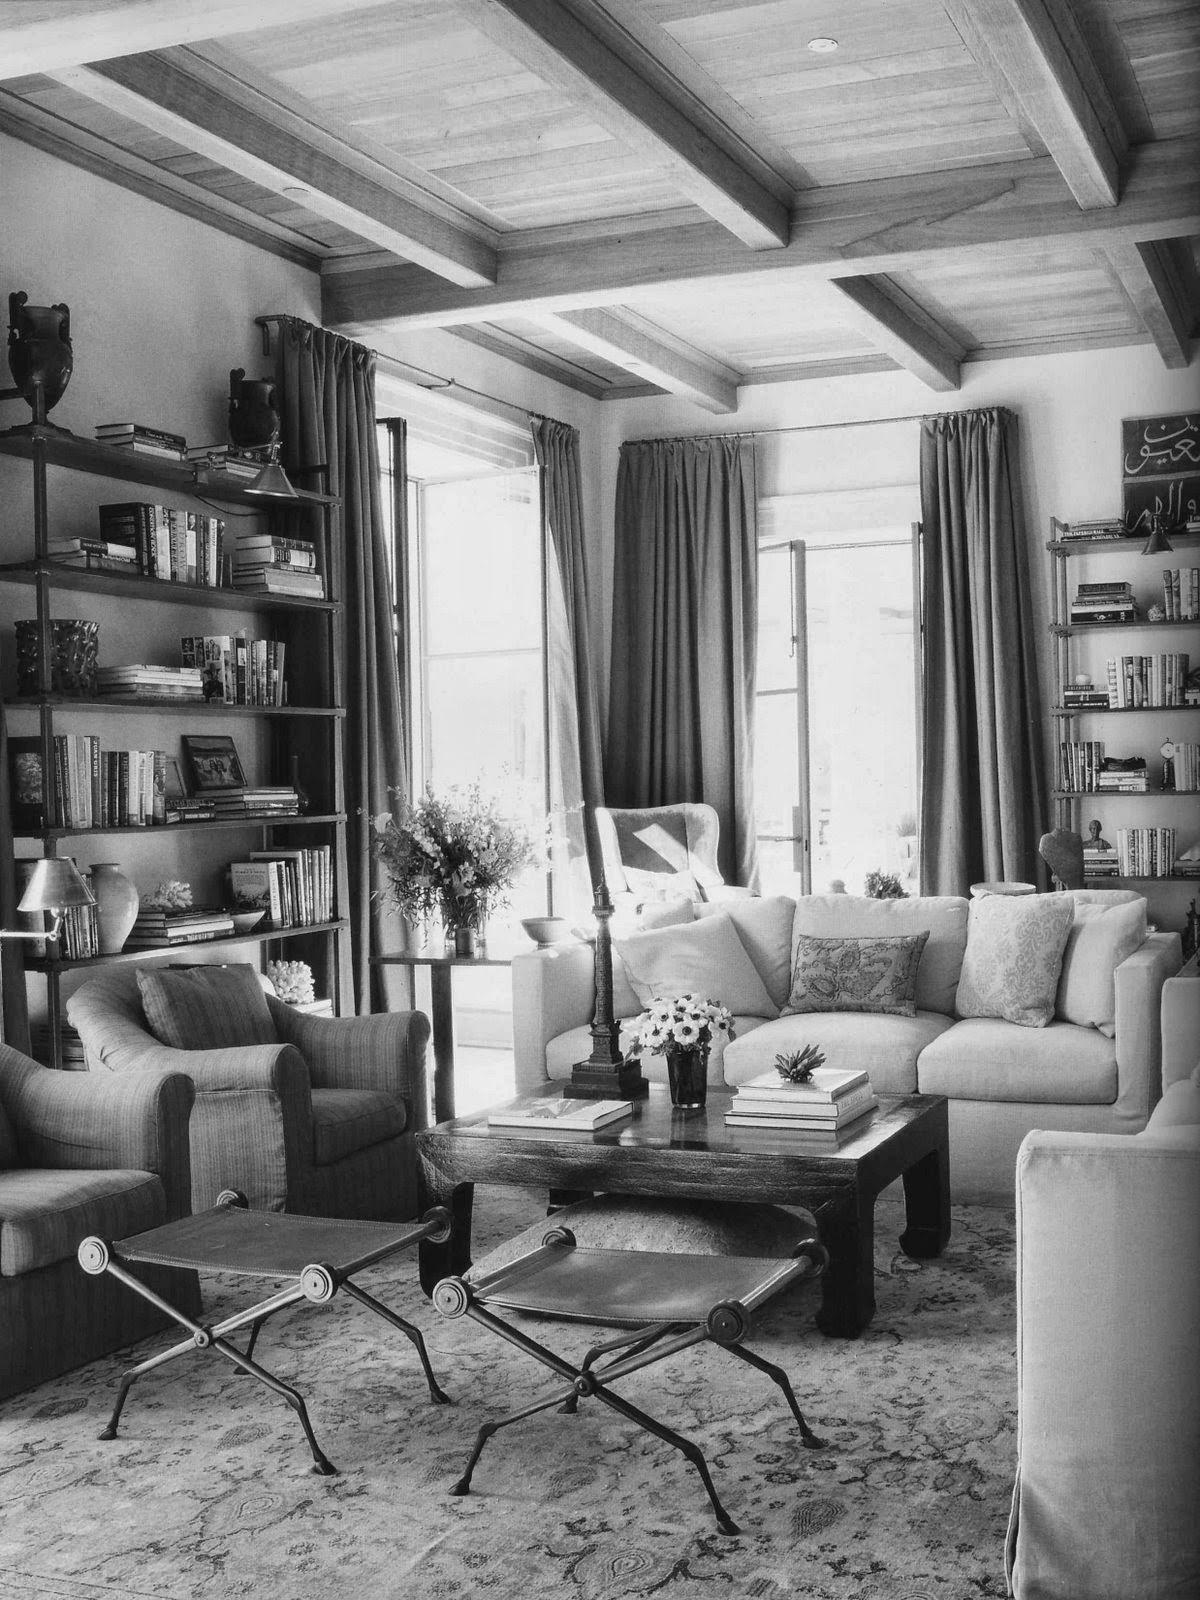 ... RR: Hugh Chisholm, RR; Henri Jova, HG Complete Guide To Interior  Decoration, 1960; Ruby Ross Wood, RR; T.H. Robsjohn Gibbings, Furniture U0026  Interiors Of ...